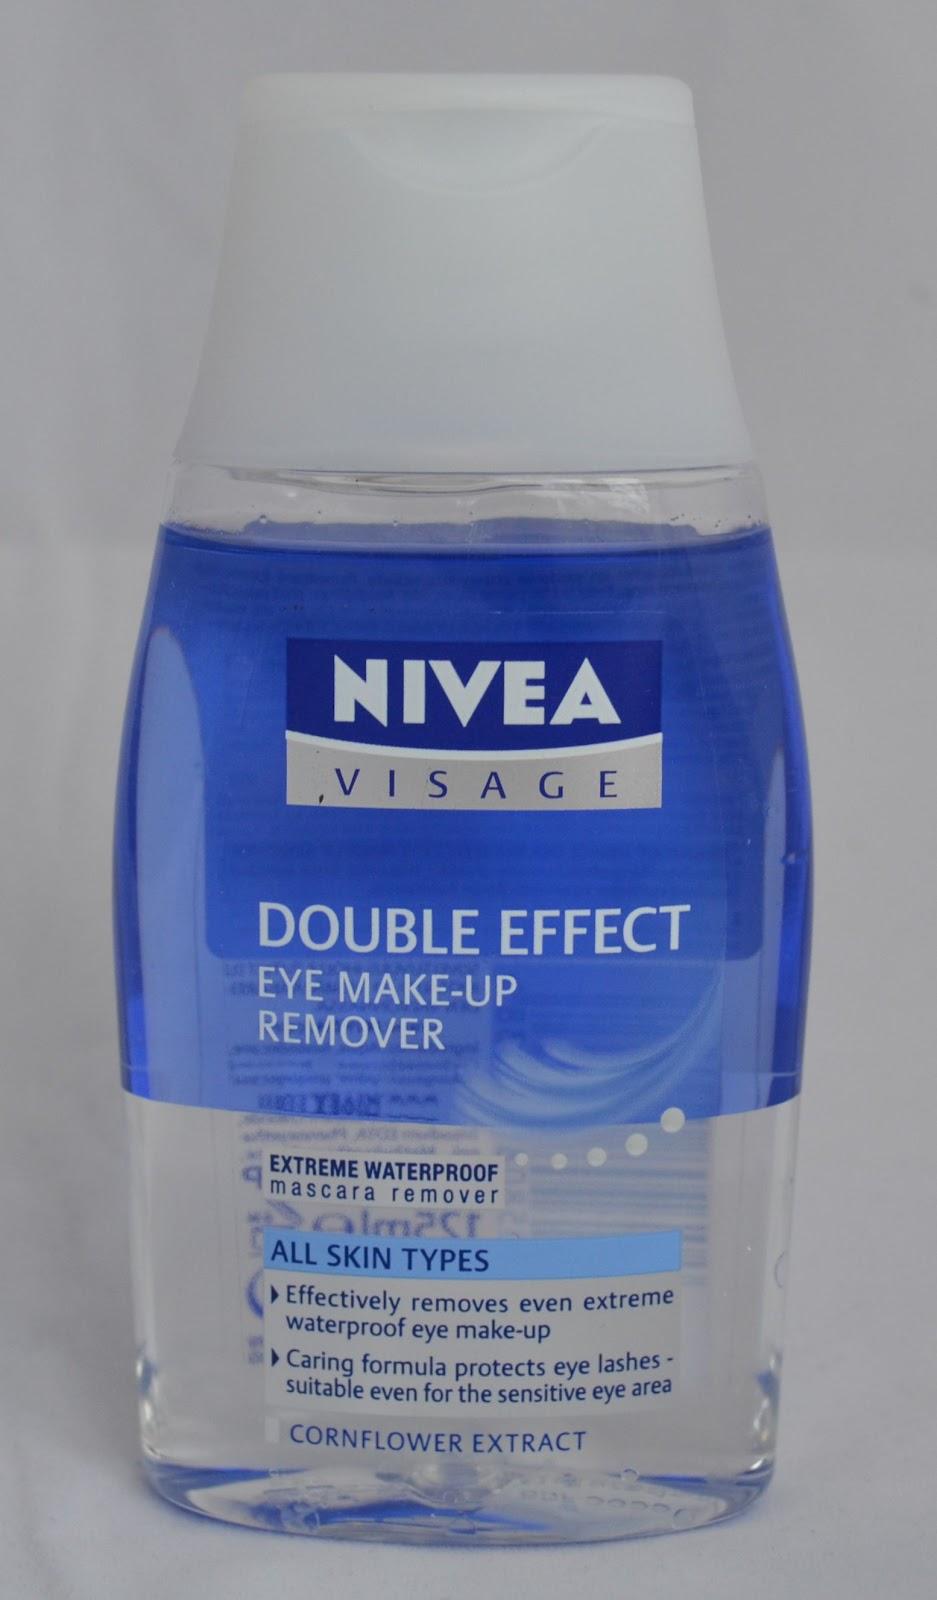 Eye Make Up Remover Miss L Nivea Double Effect Eye Make Up Remover